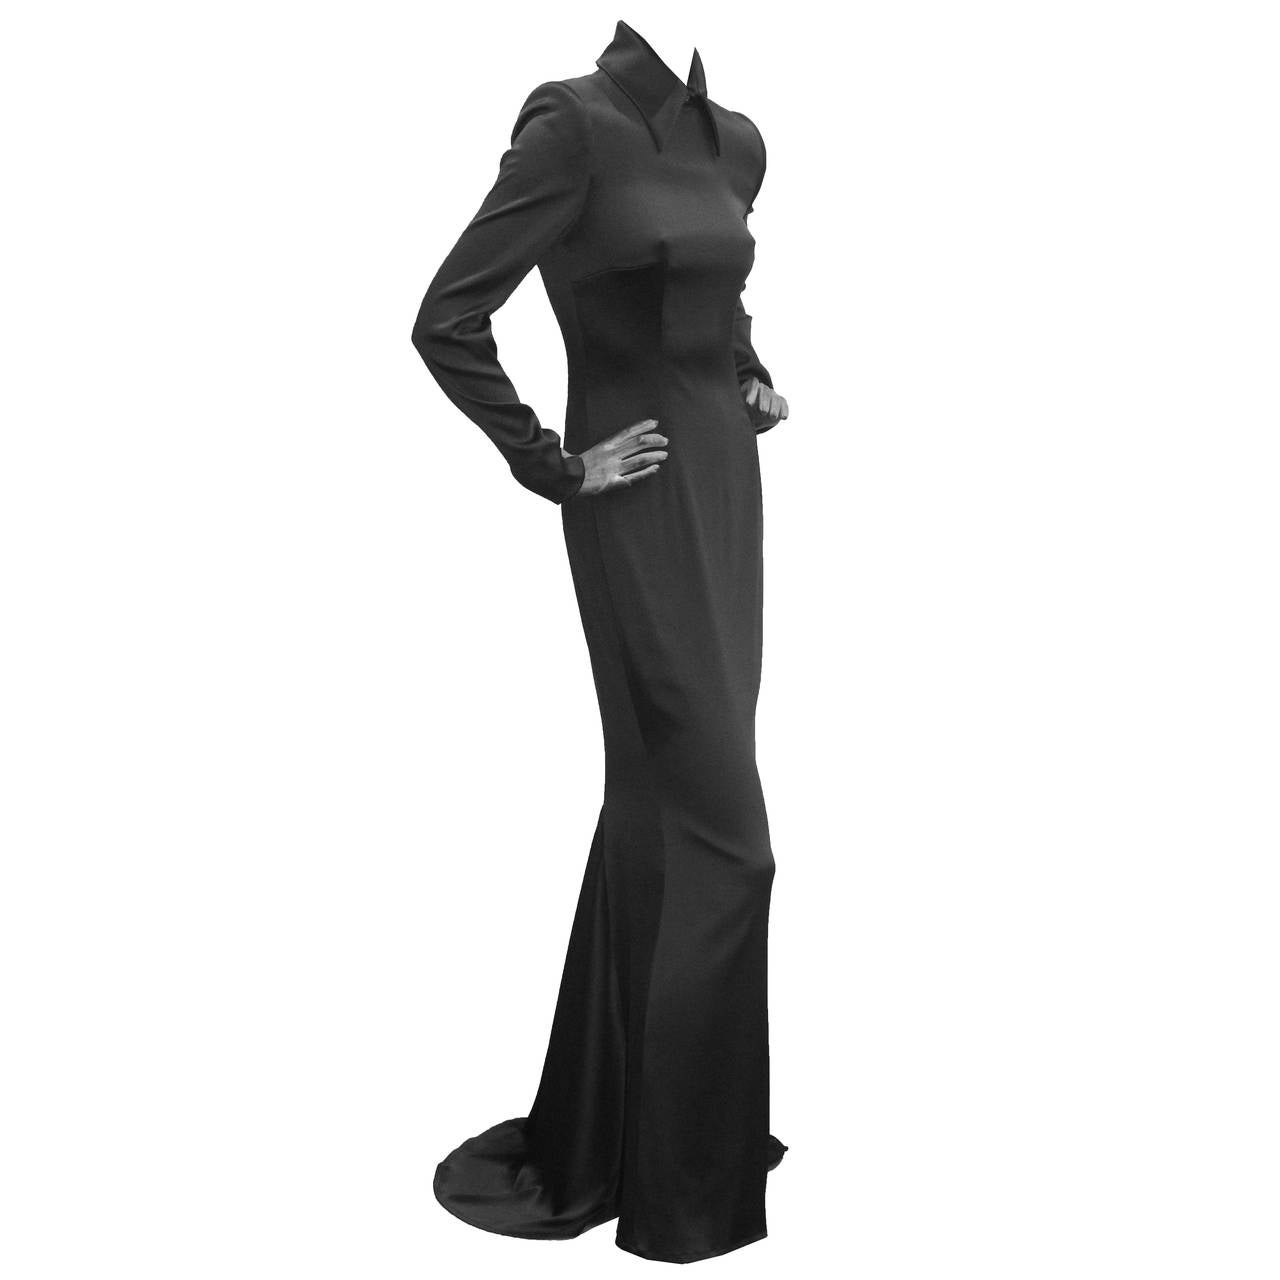 1990s Givenchy by Alexander McQueen Black Silk Evening Dress (Unworn) 1